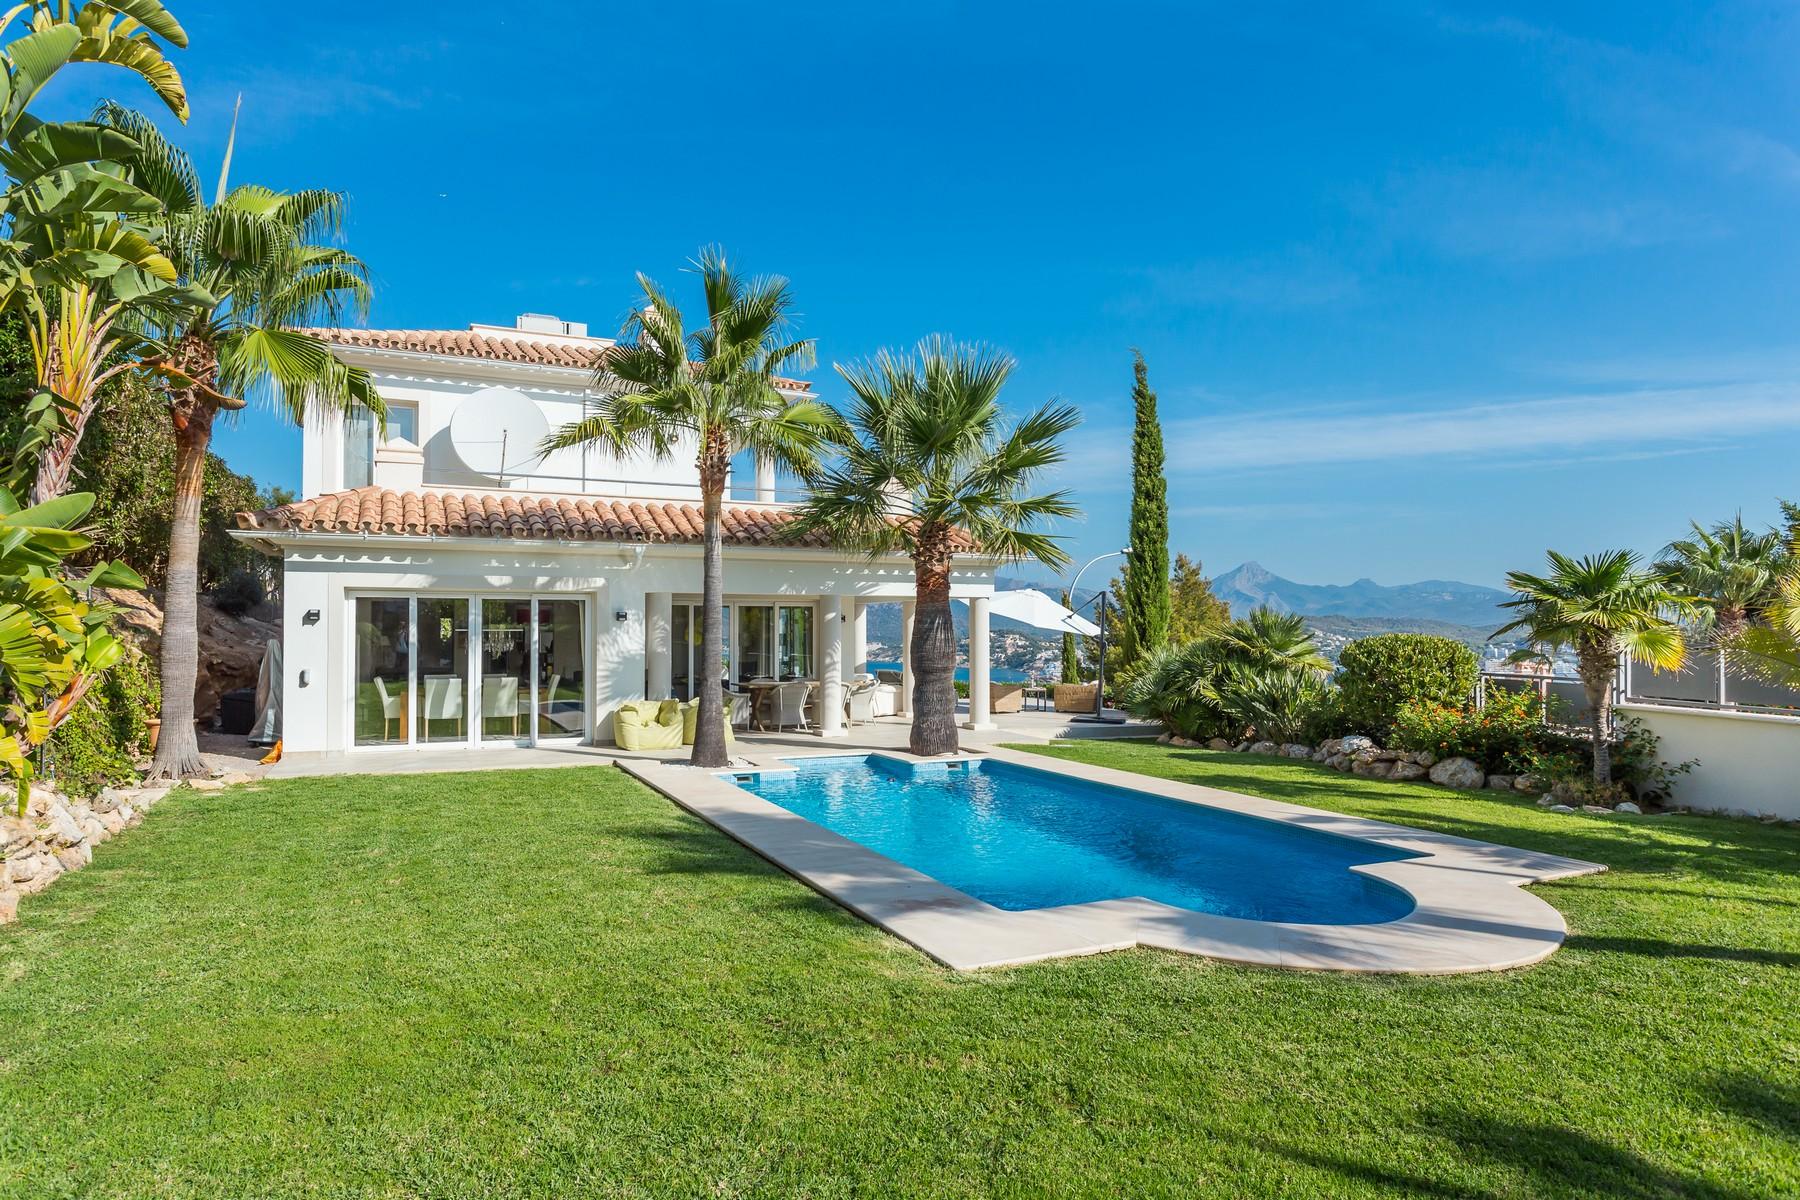 Single Family Home for Sale at Luxury villa with panoramic views in Santa Ponsa Nova Santa Ponsa, Mallorca, 07180 Spain